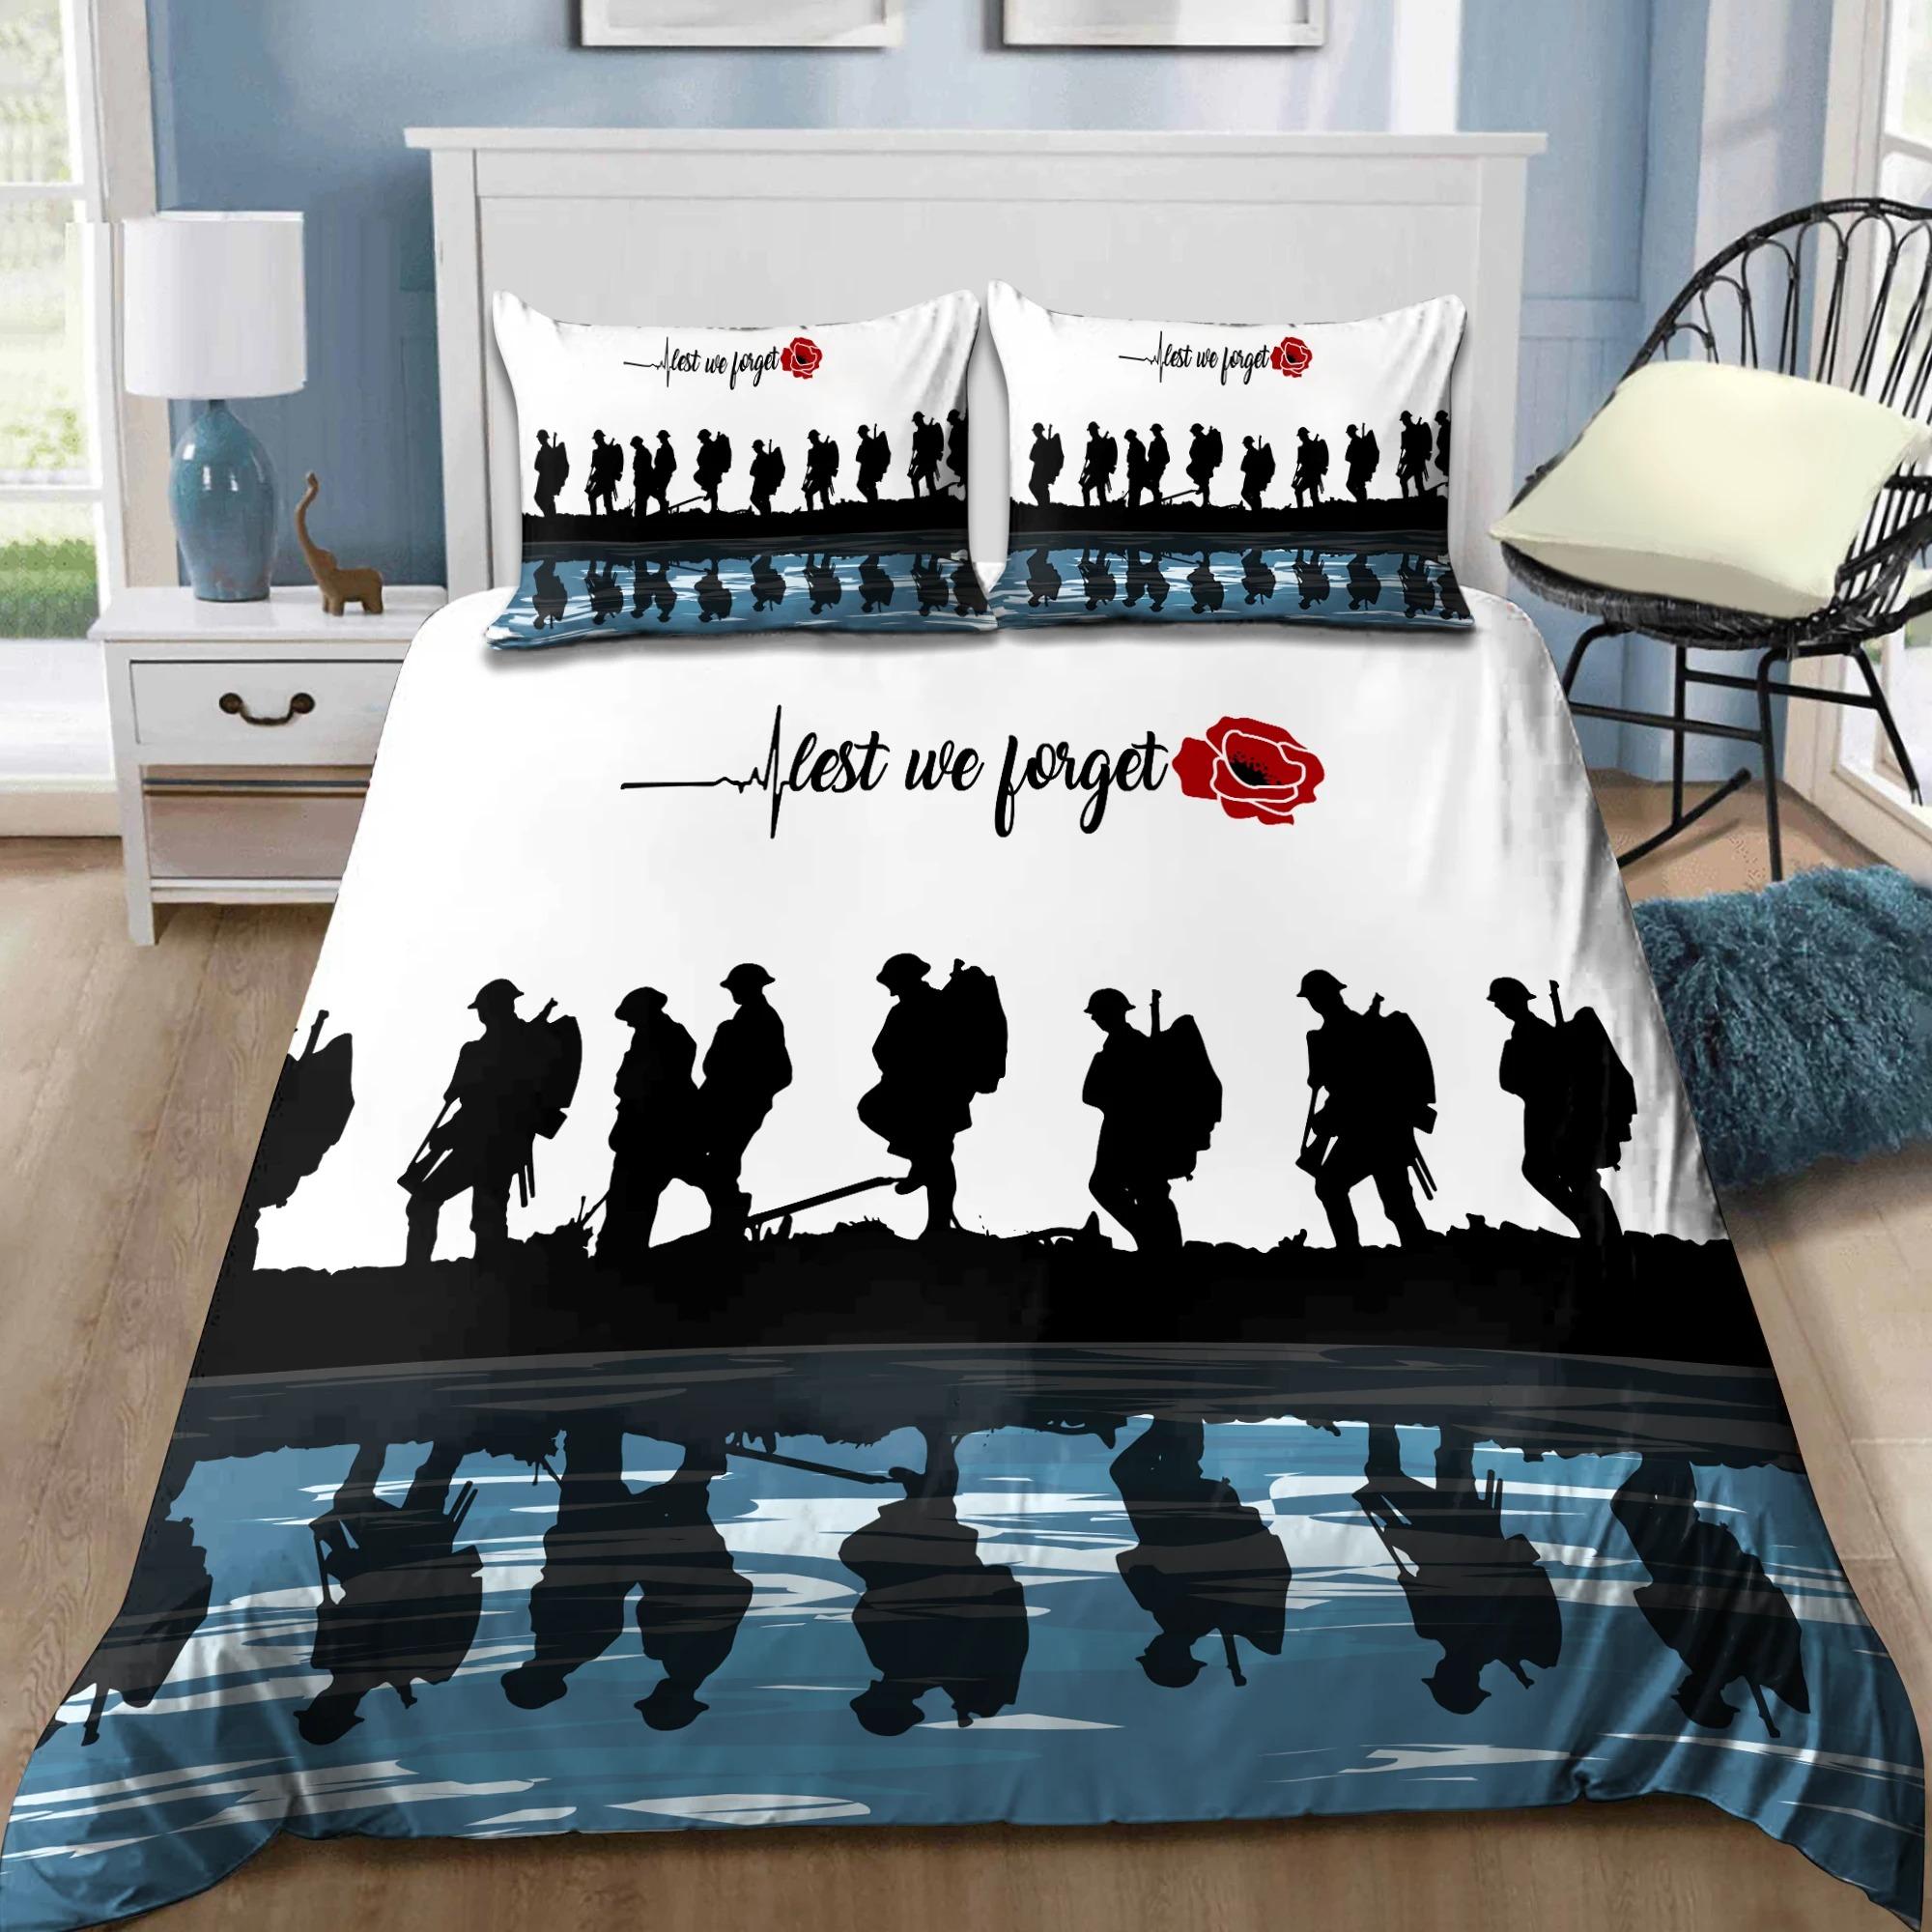 UK Veteran Let we forget honor the fallen bedding set 1